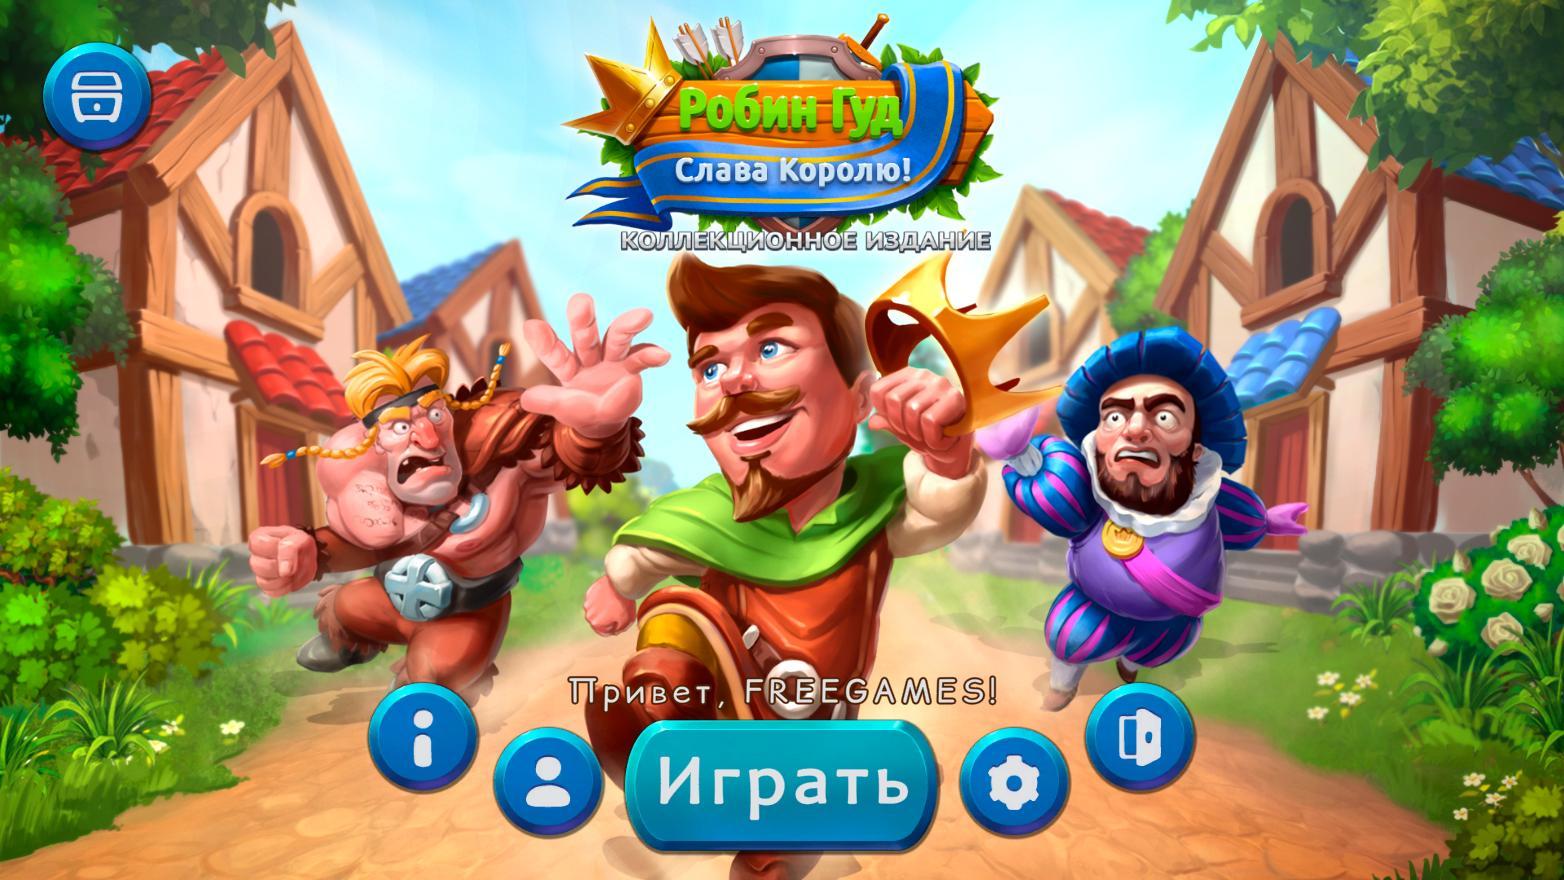 Робин Гуд 3: Слава королю. Коллекционное издание | Robin Hood 3: Hail to the King CE (Rus)